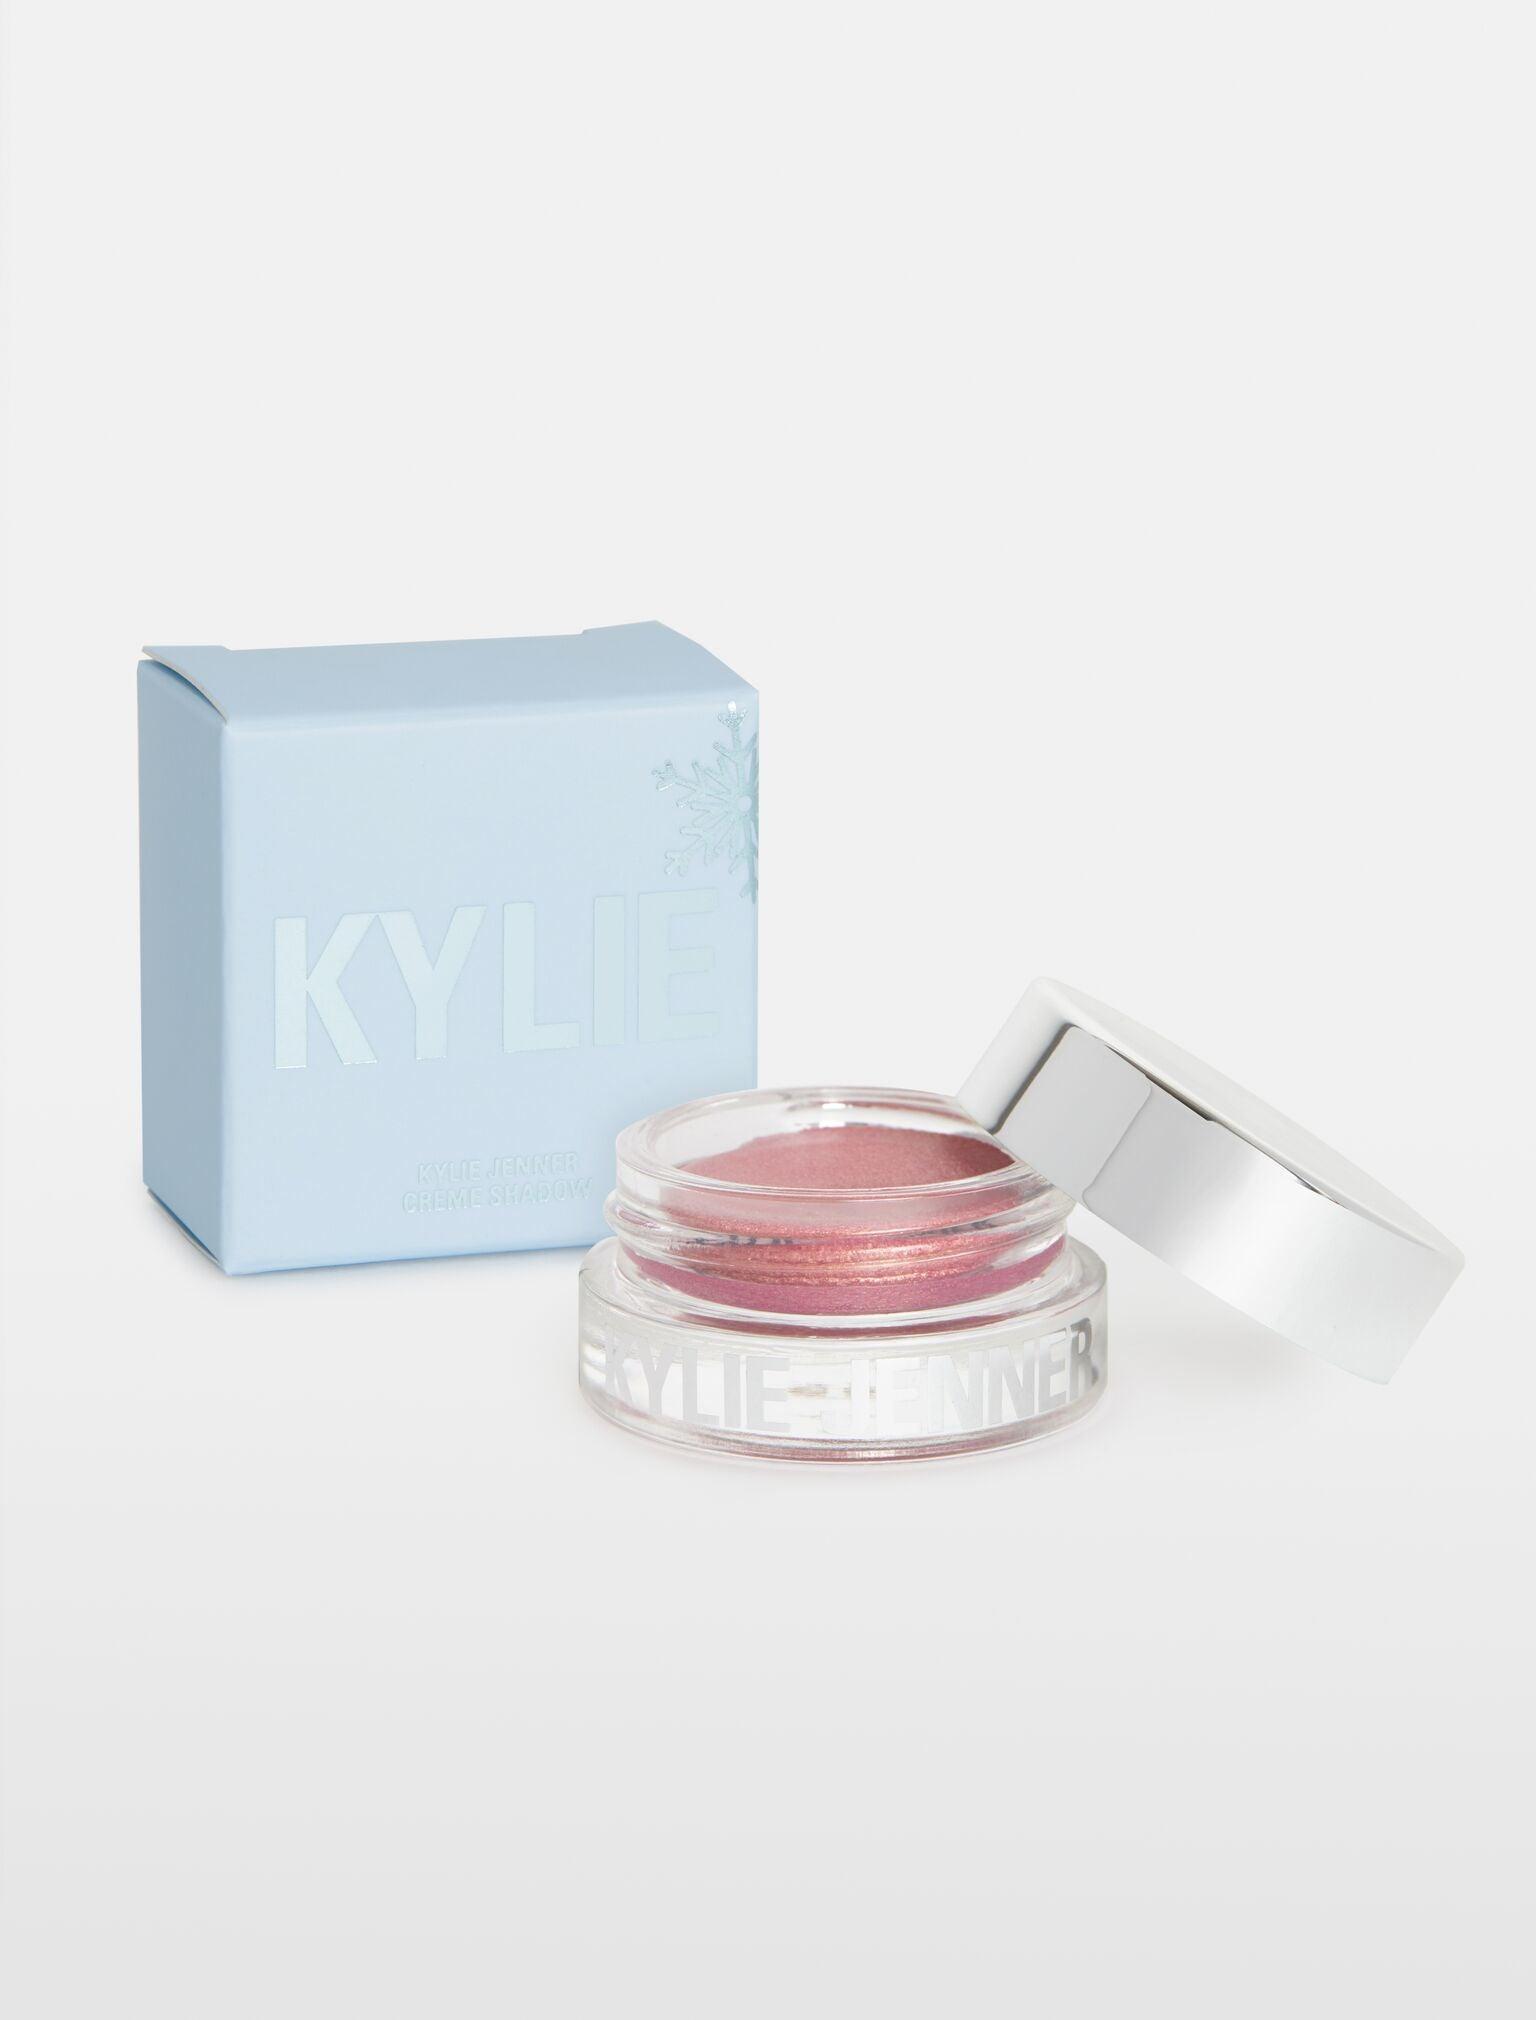 Kylie Cosmetics - Crème Shadow, Northern Lights